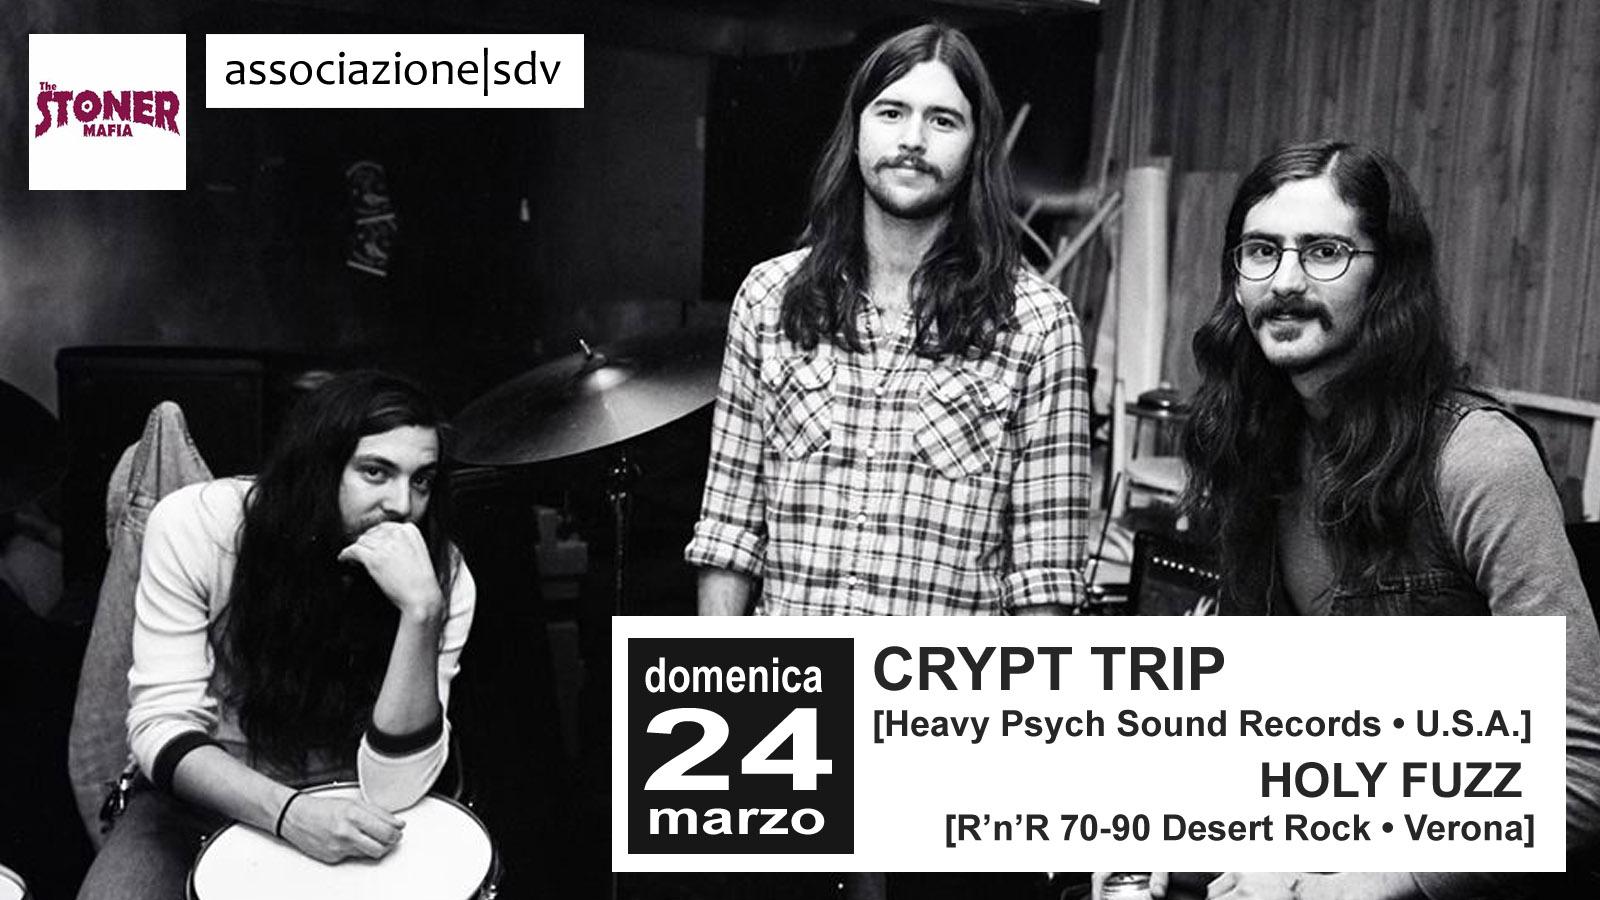 LIVE Crypt Trip + Holy Fuzz – domenica 24 marzo 2019 –